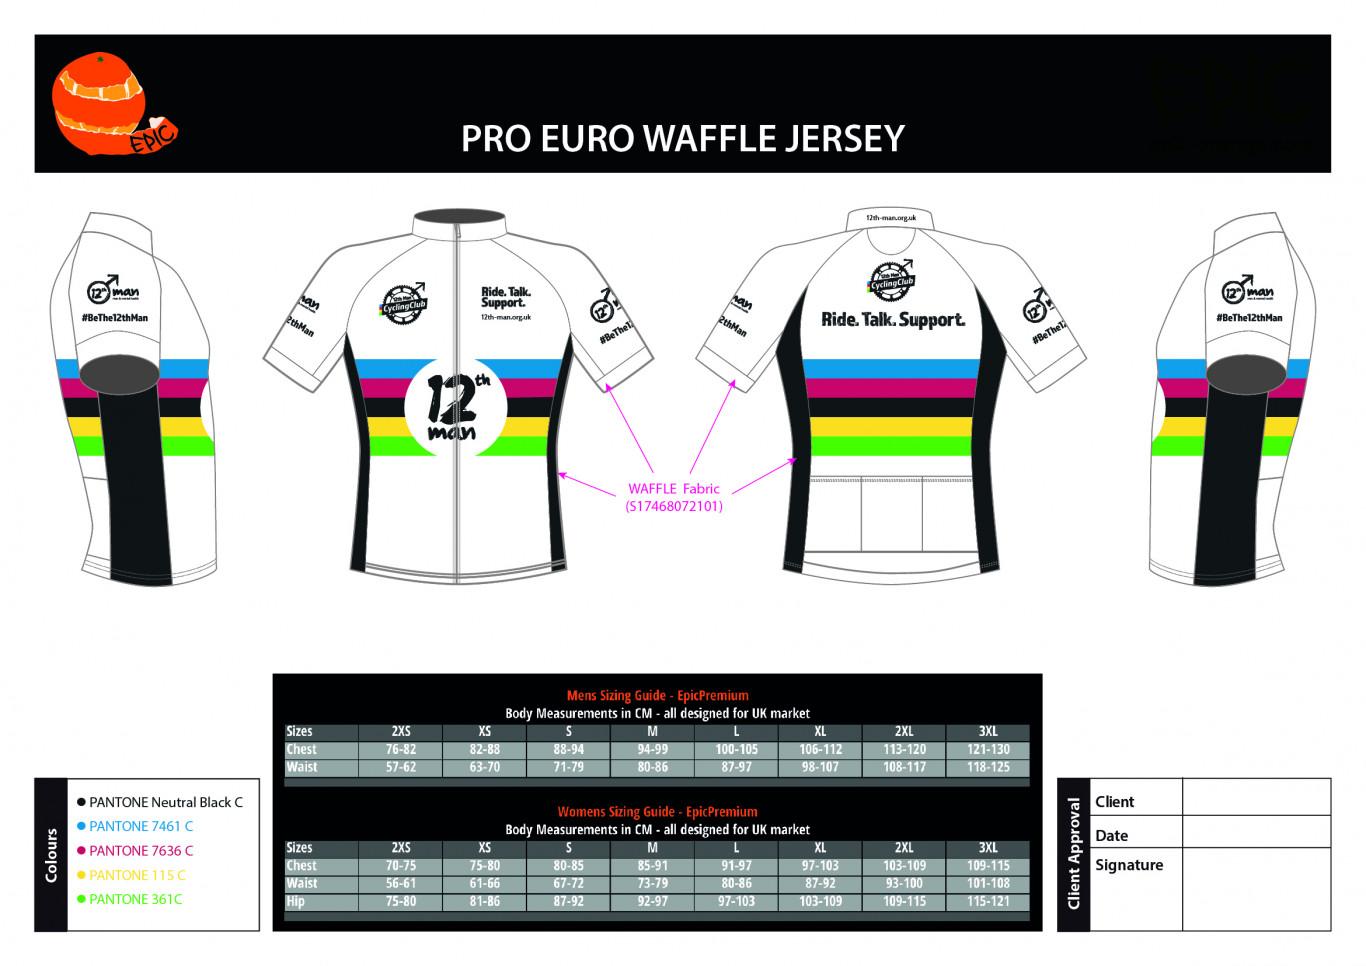 12th Man Cycling Club Jersey (White)